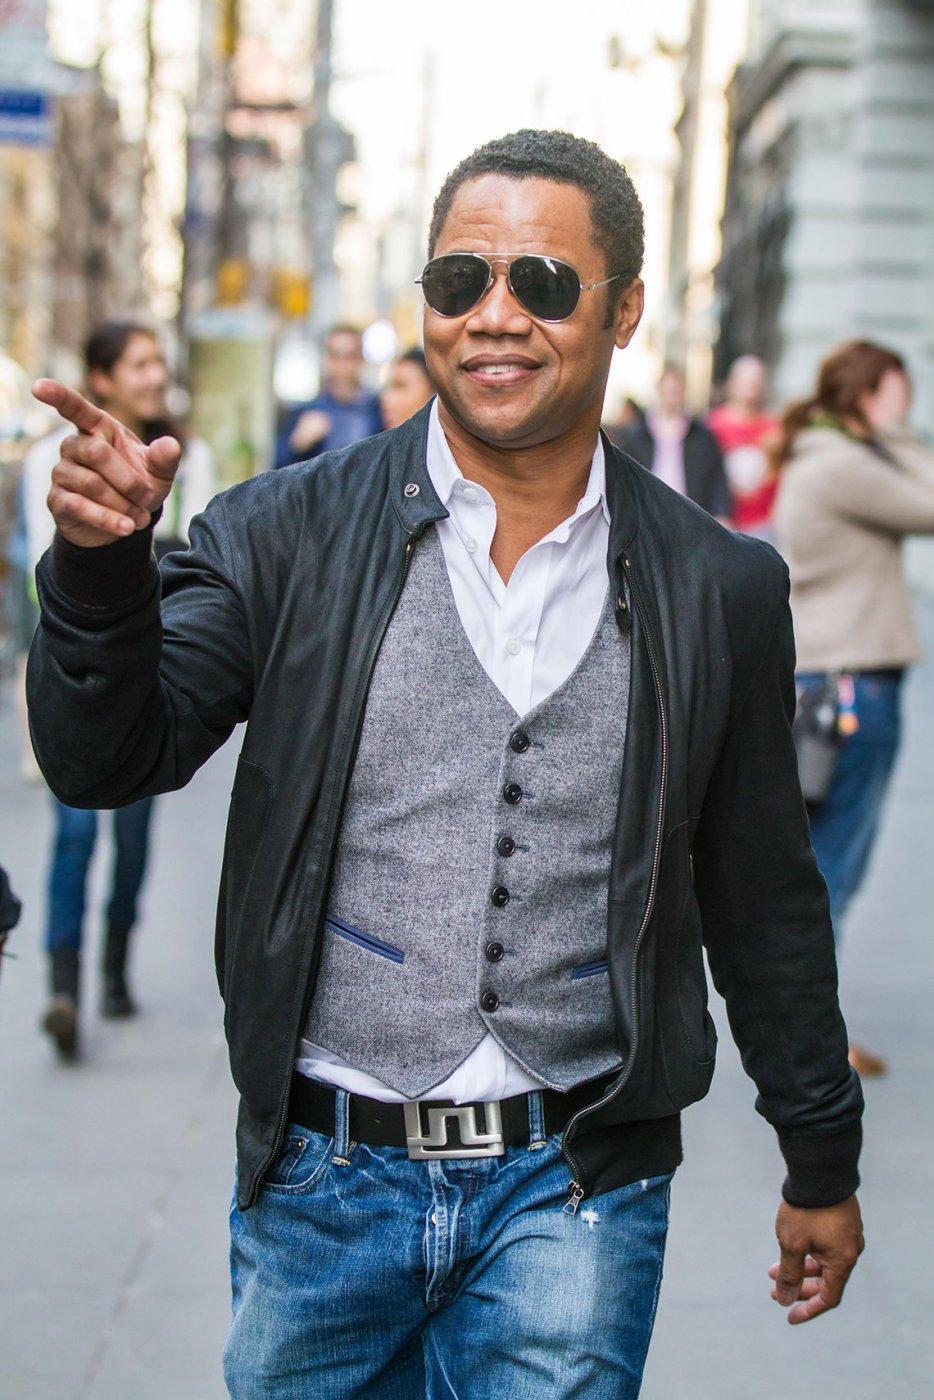 Guia De Jeans Para Hombres Mayores De 50